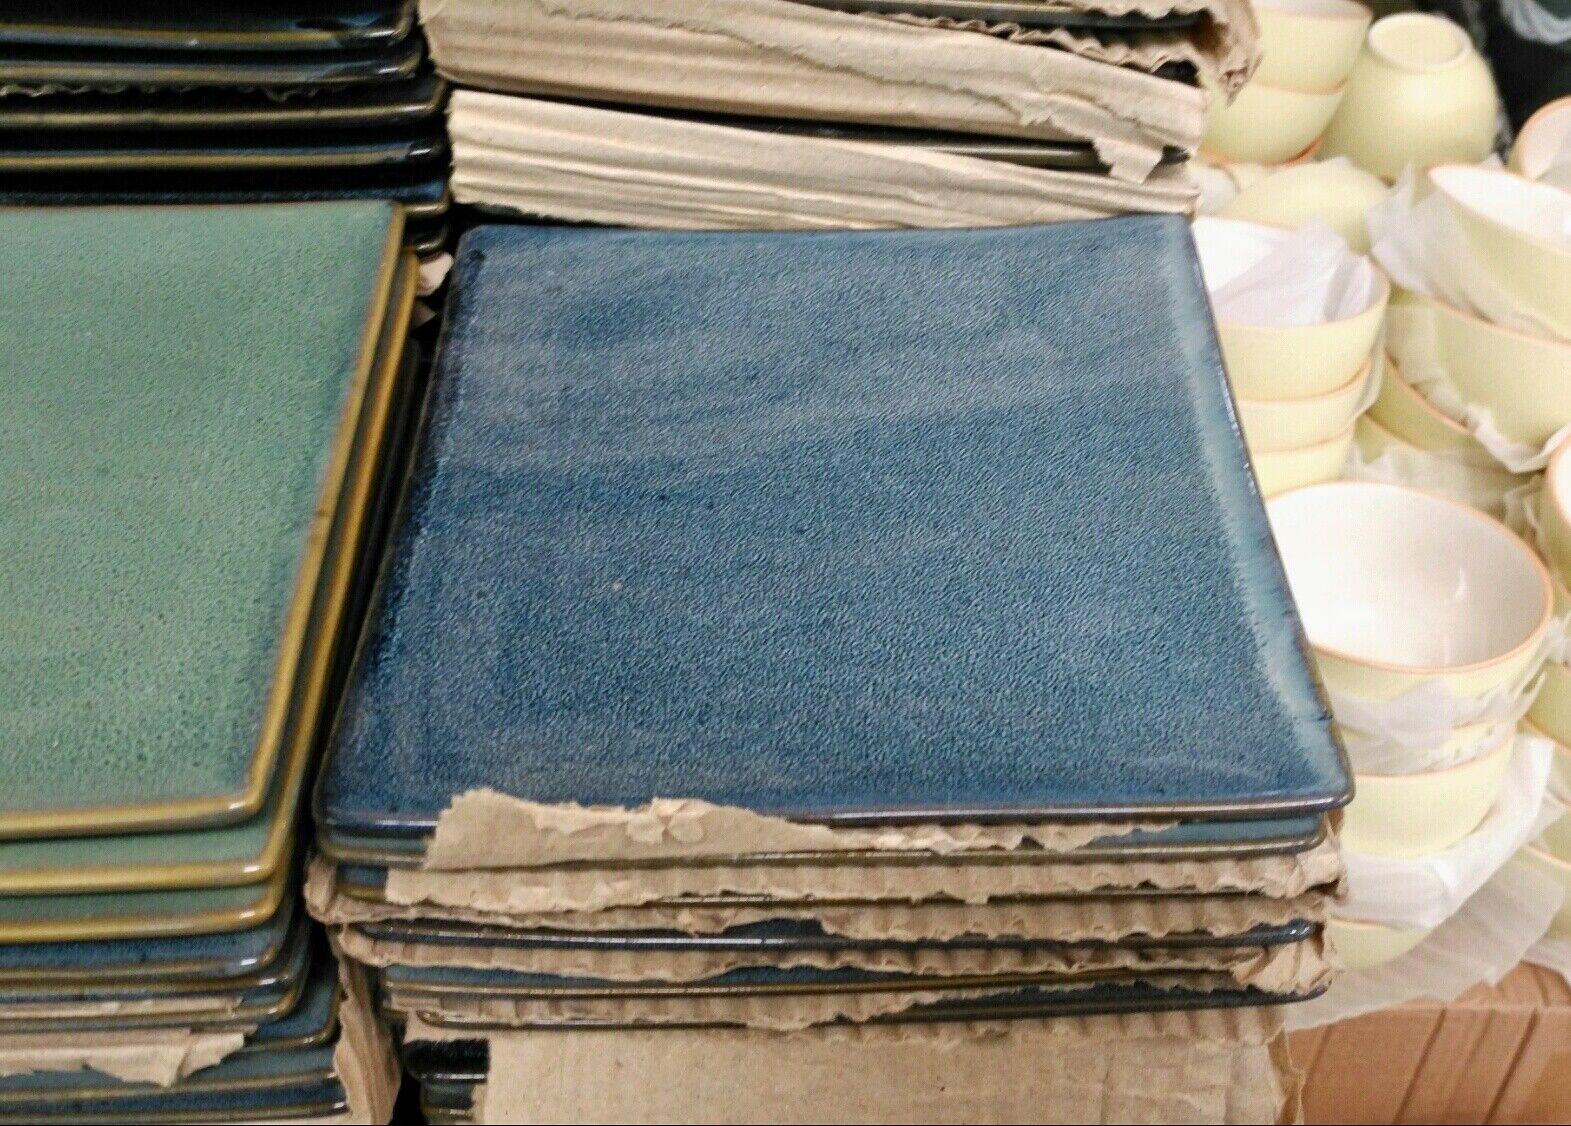 60  Porzellanteller Bunt Grün/Blau Teller Porzellan  15,5cm Seitenlänge Quadrat